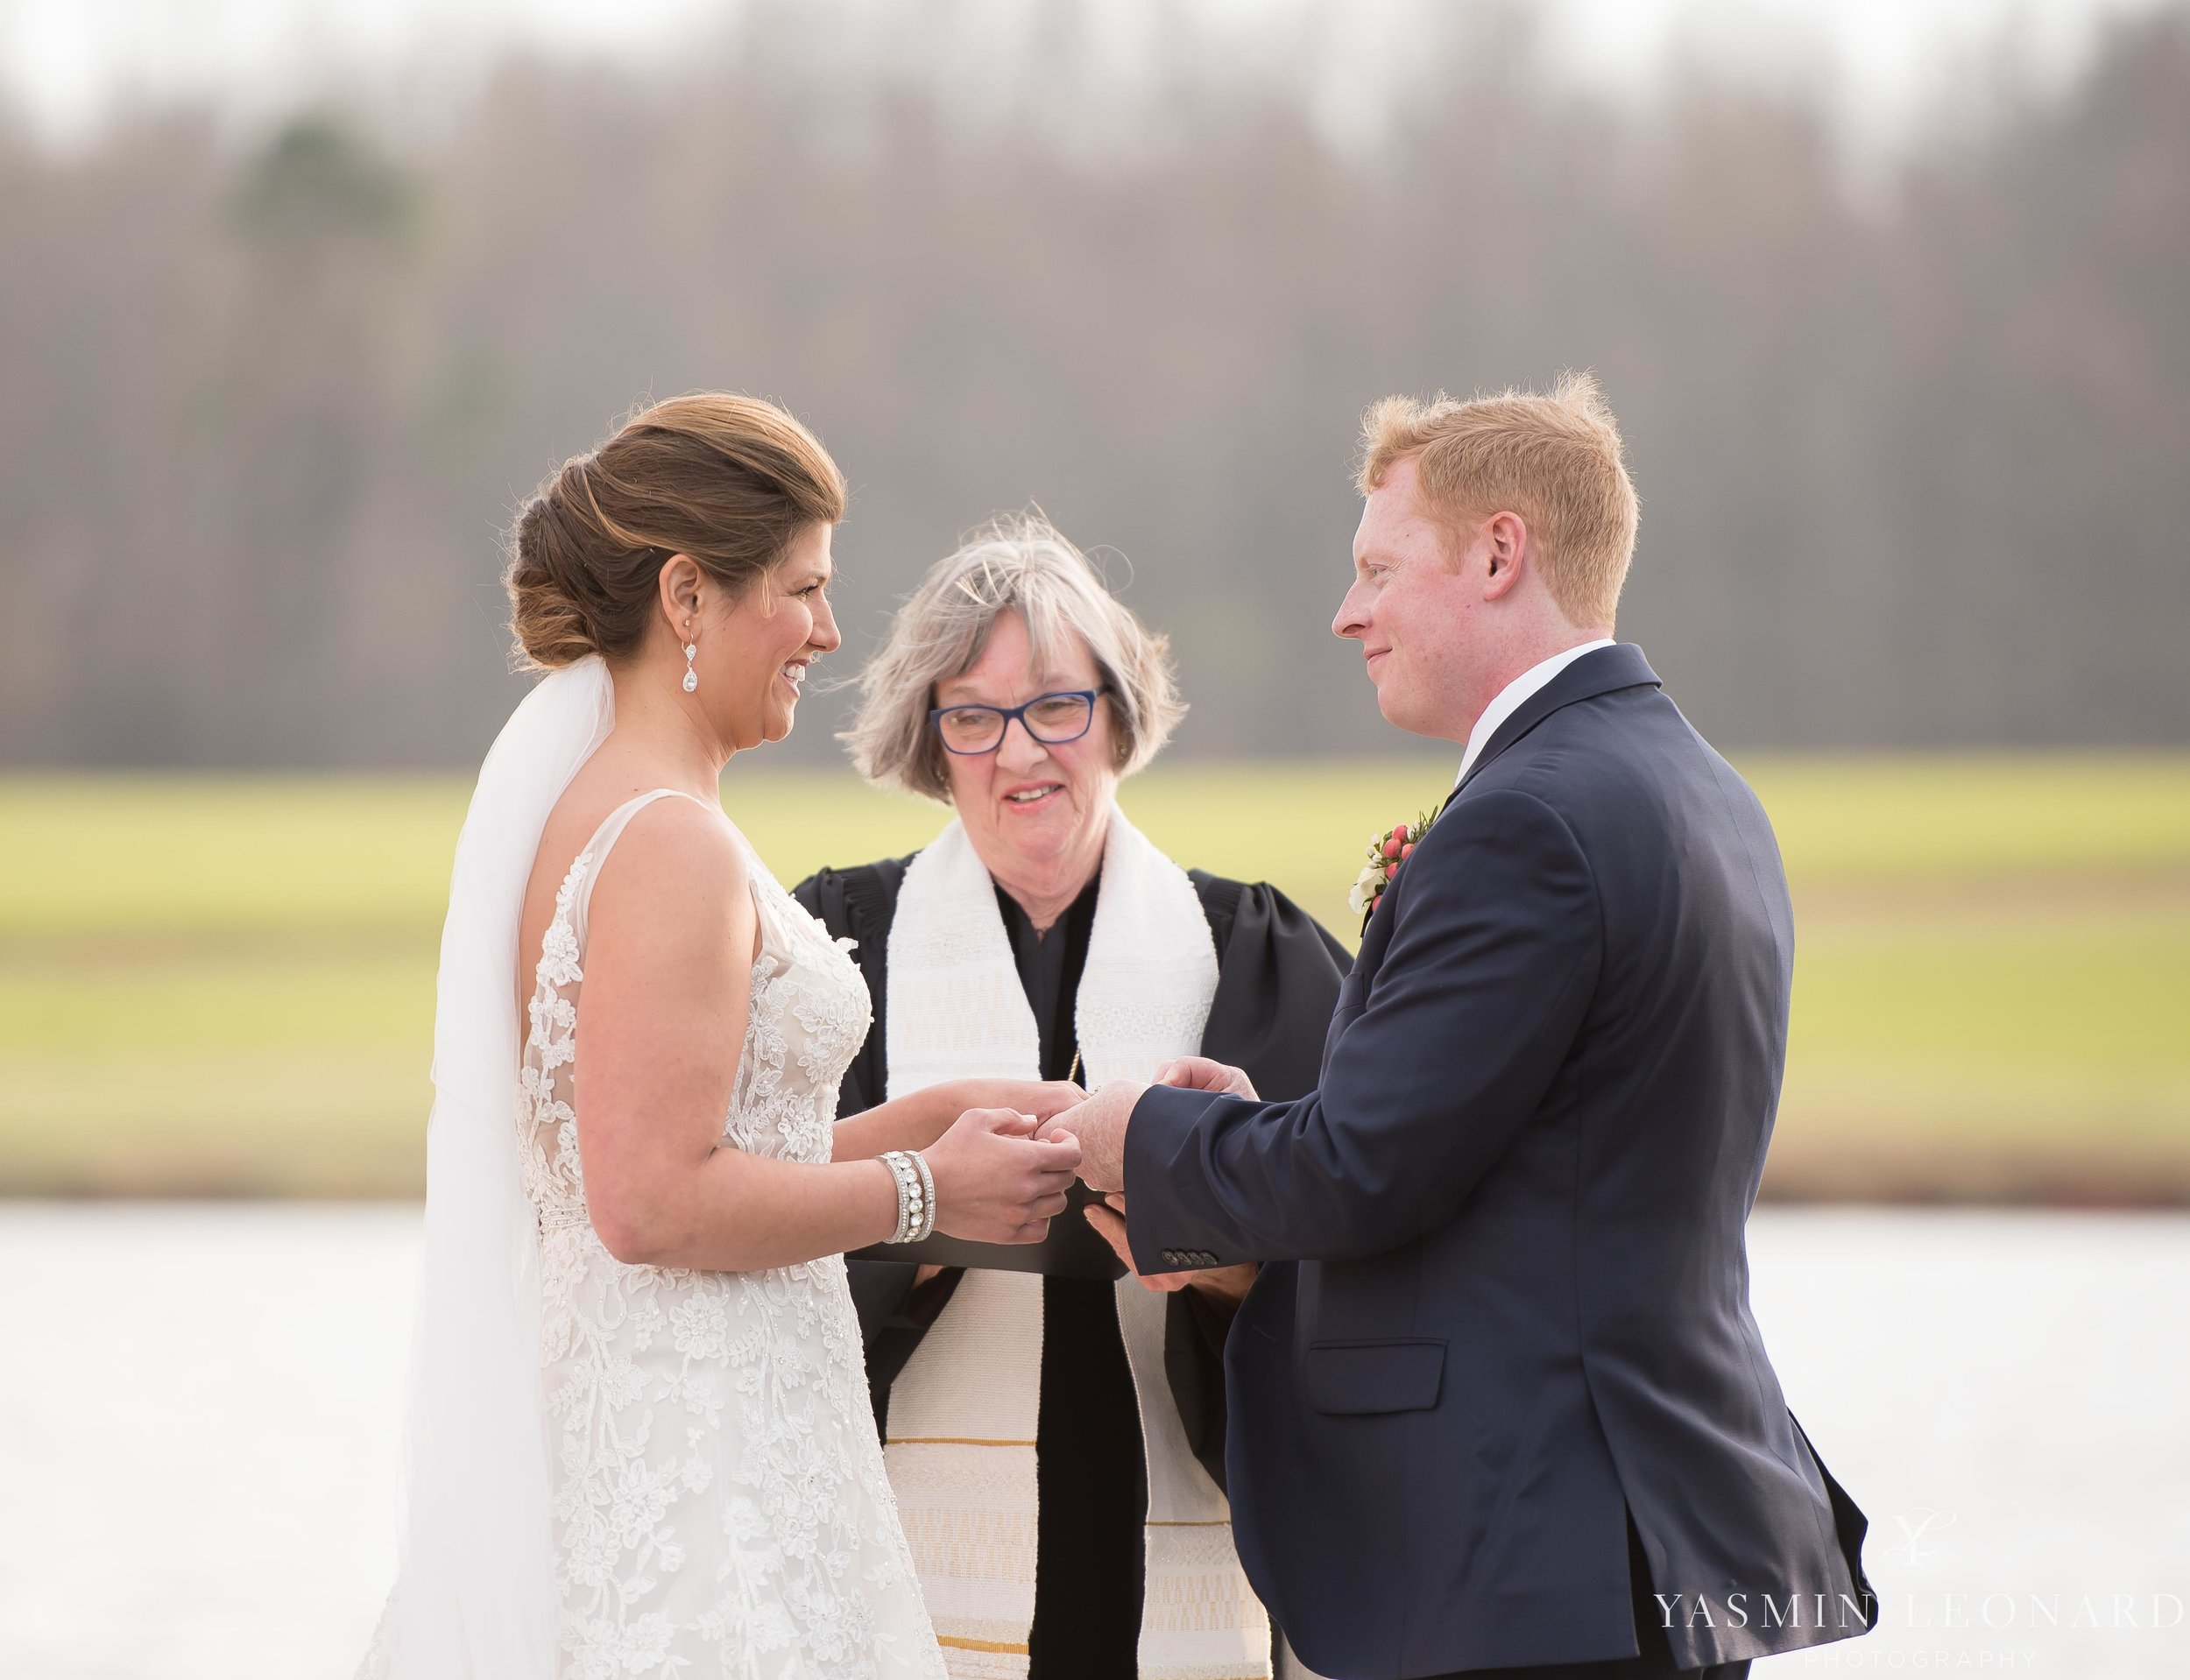 Adaumont Farm - Adaumont Farm Weddings - Trinity Weddings - NC Weddings - Yasmin Leonard Photography-36.jpg